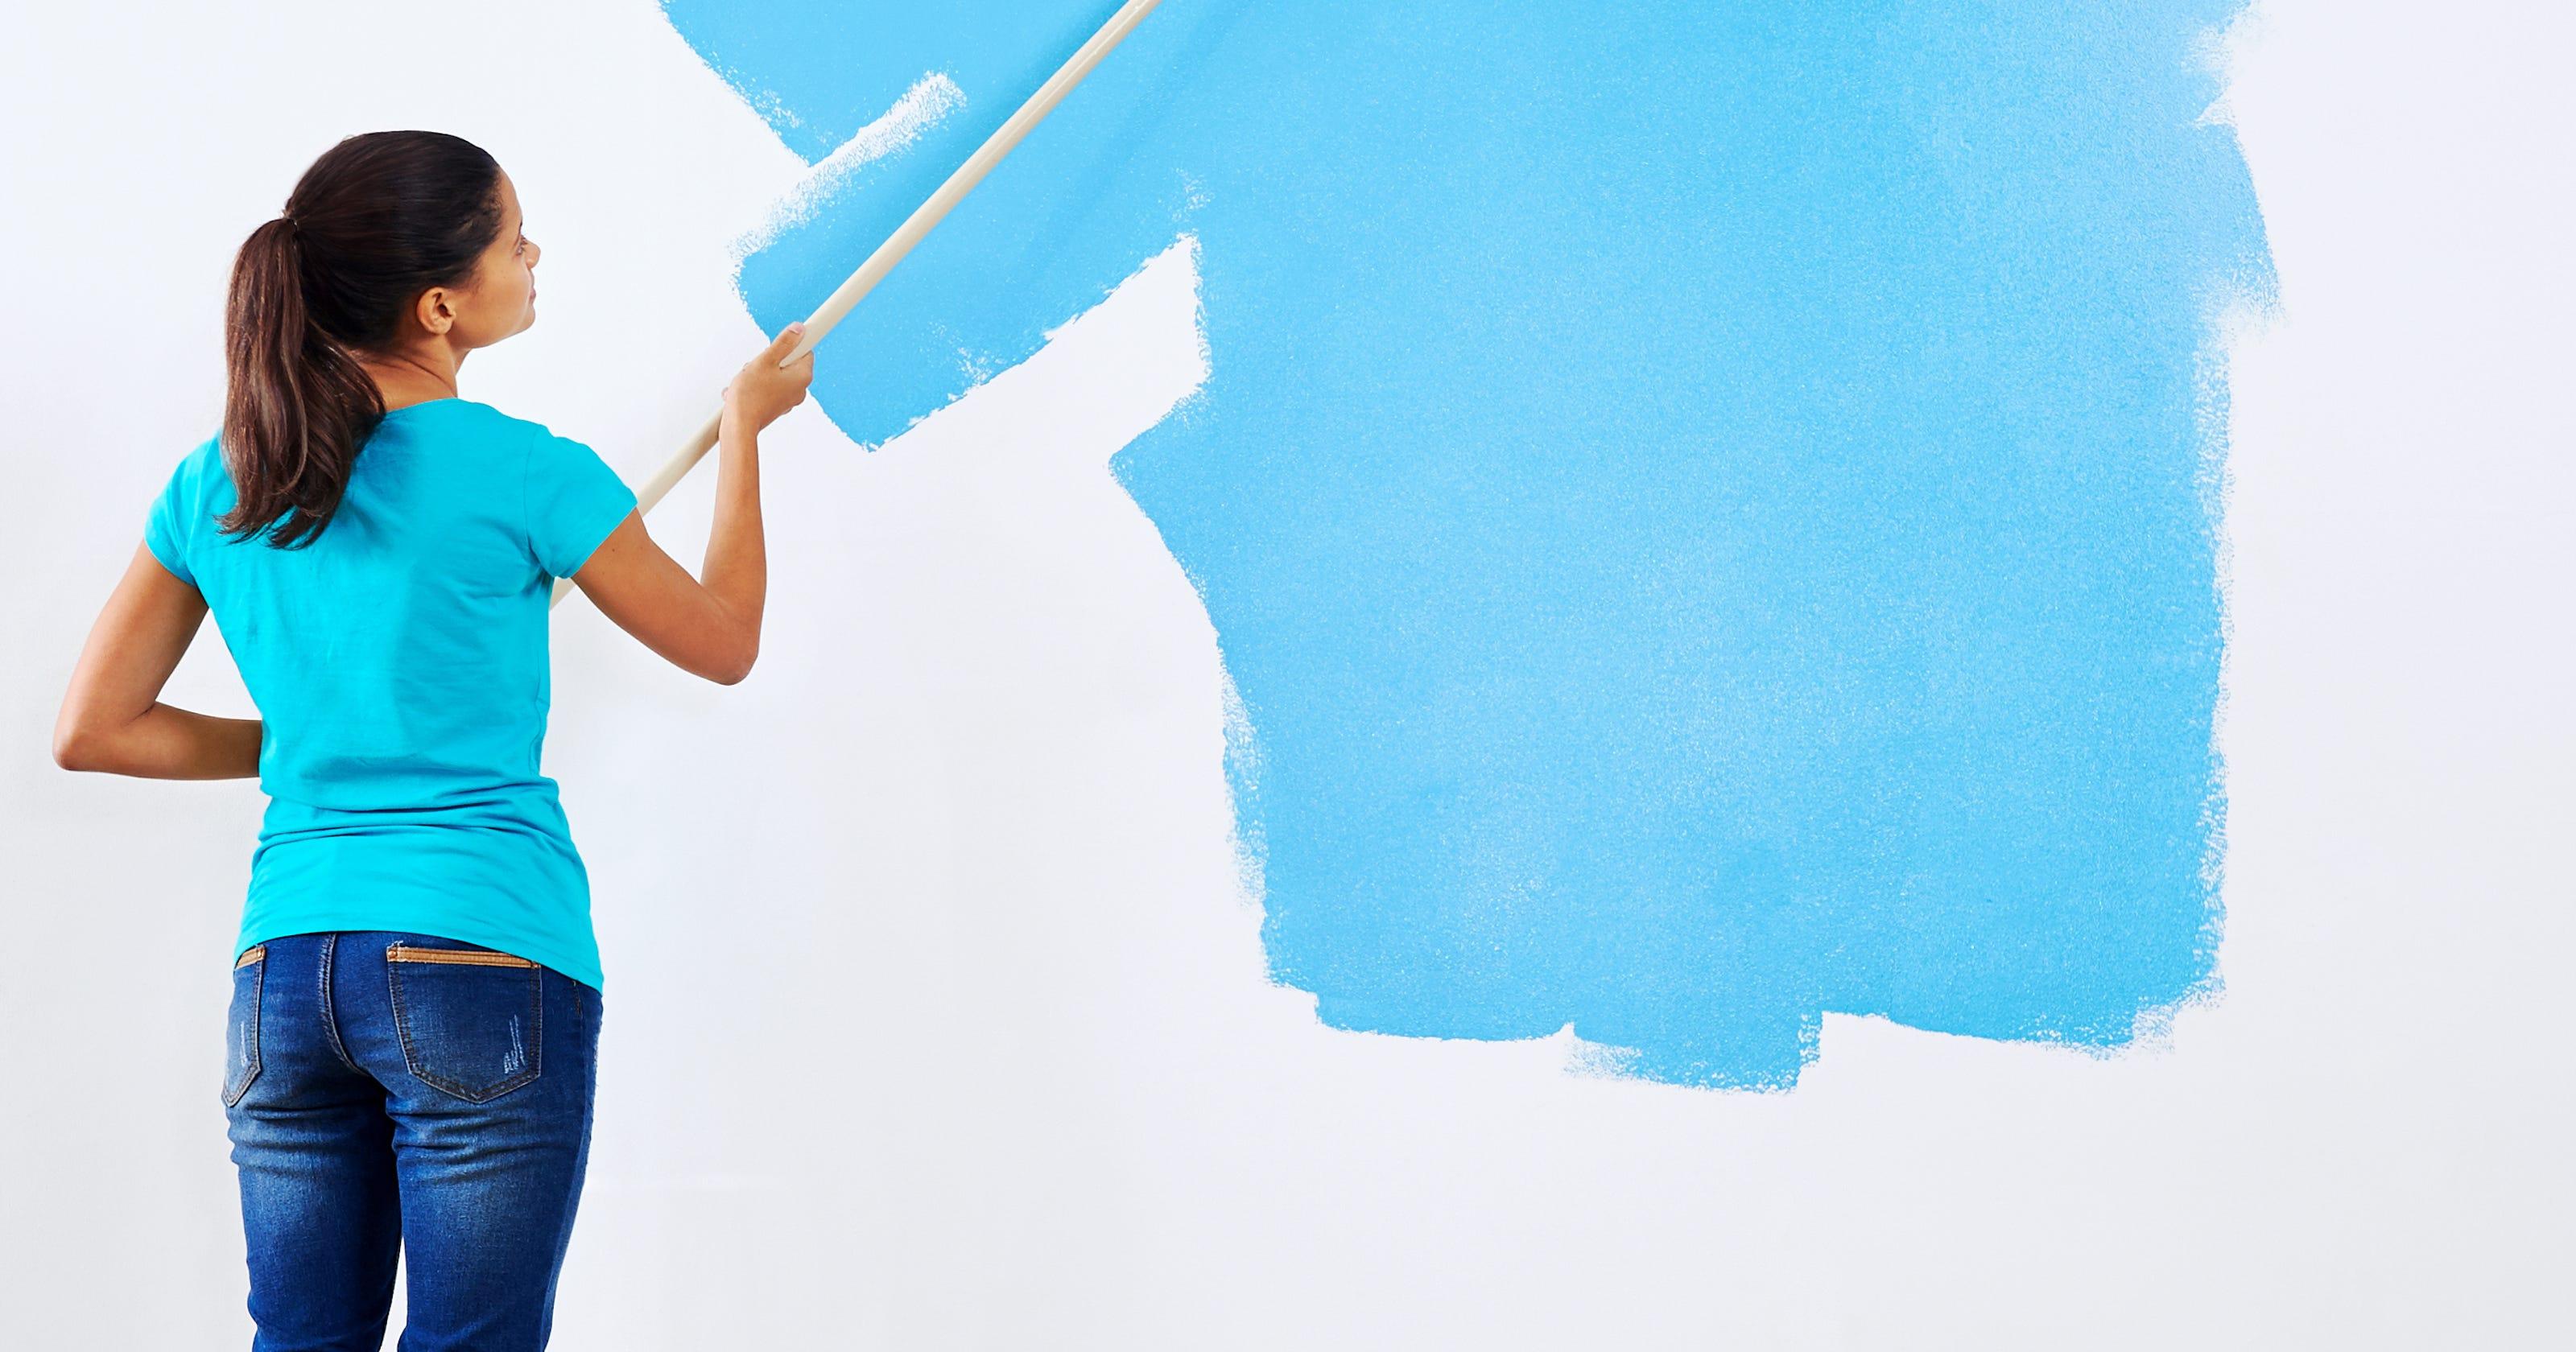 low voc and bacteria killing paint makes a home healthier